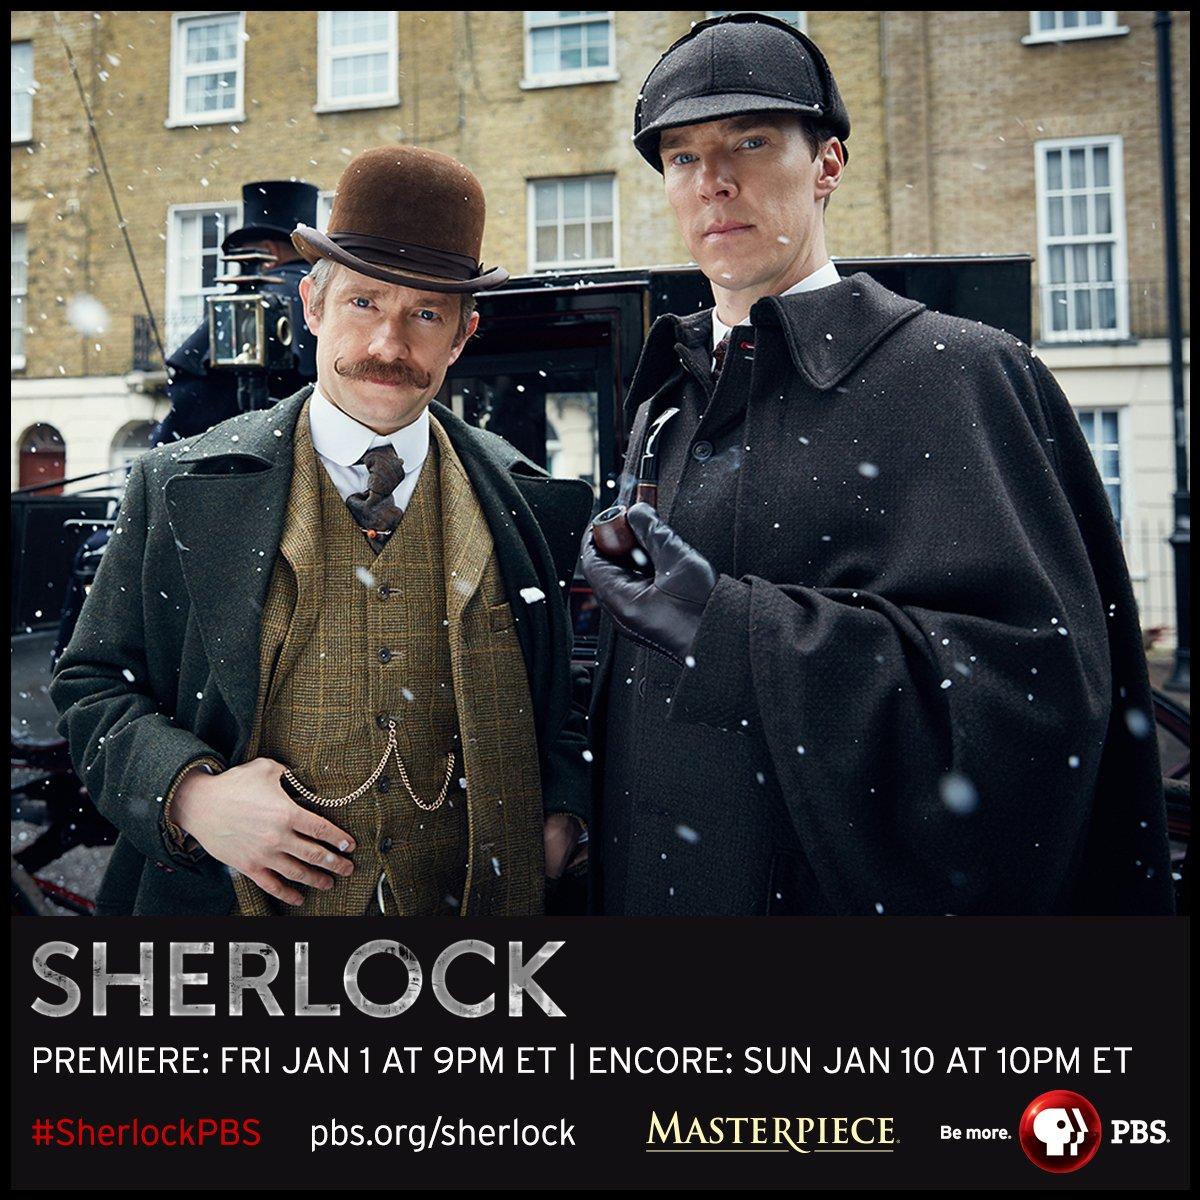 #SherlockPBS: The Abominable Bride premieres 1/1 & encore 1/10 MASTERPIECE @PBS. NEW pics - https://t.co/3az8JwUINo https://t.co/Fi9YrHk7uz